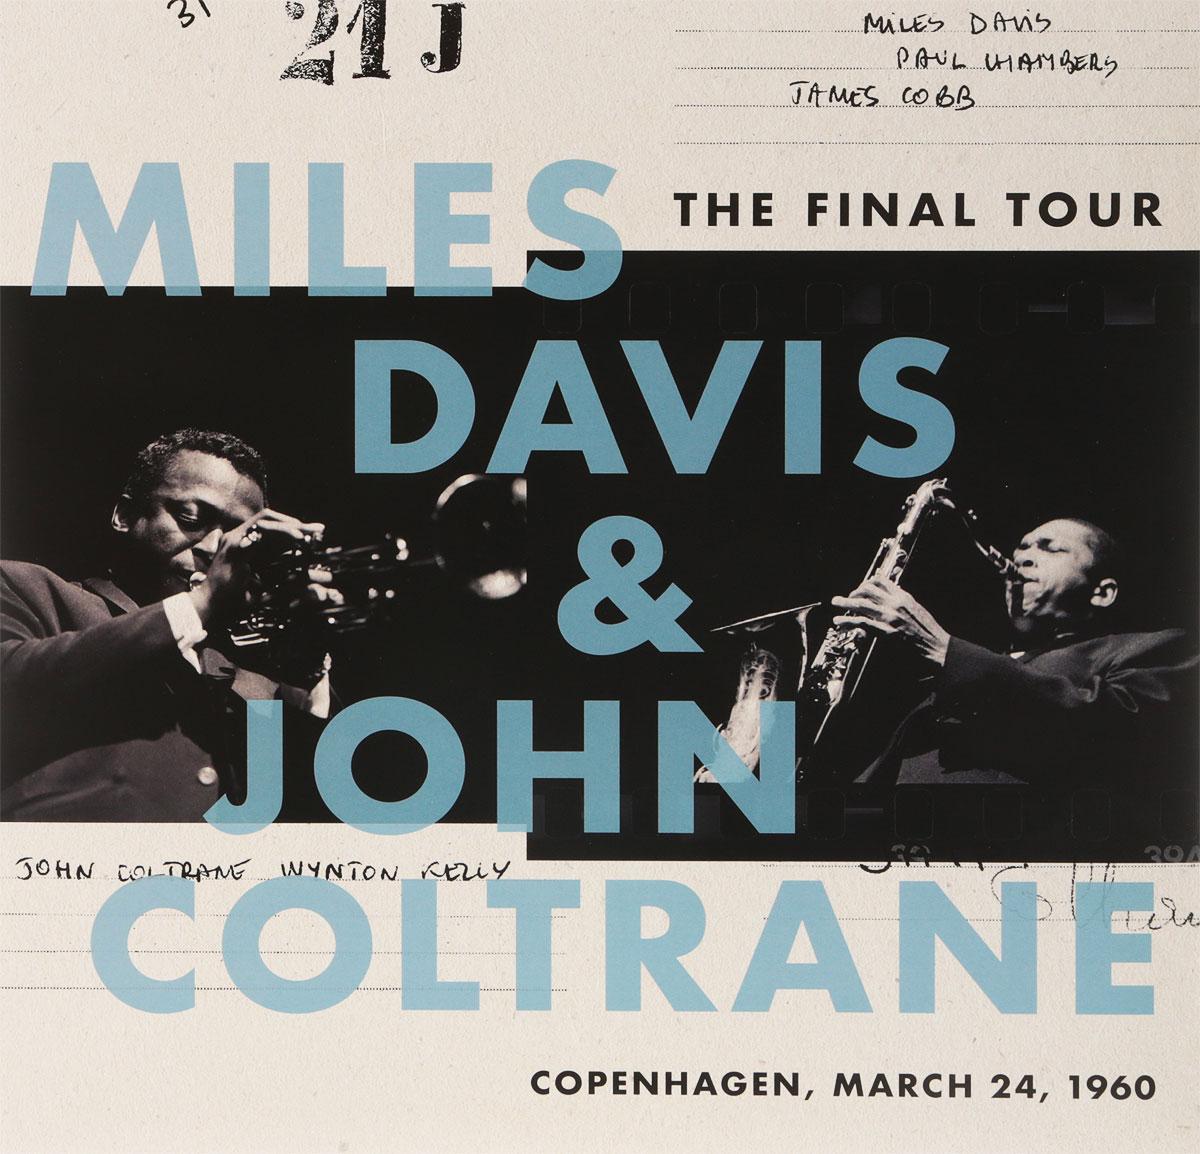 Майлз Дэвис,Джон Колтрейн Miles Davis, John Coltrane. The Final Tour. Copenhagen, March 24, 1960 (LP) джон колтрейн john coltrane giant steps the best of the early years 10 cd